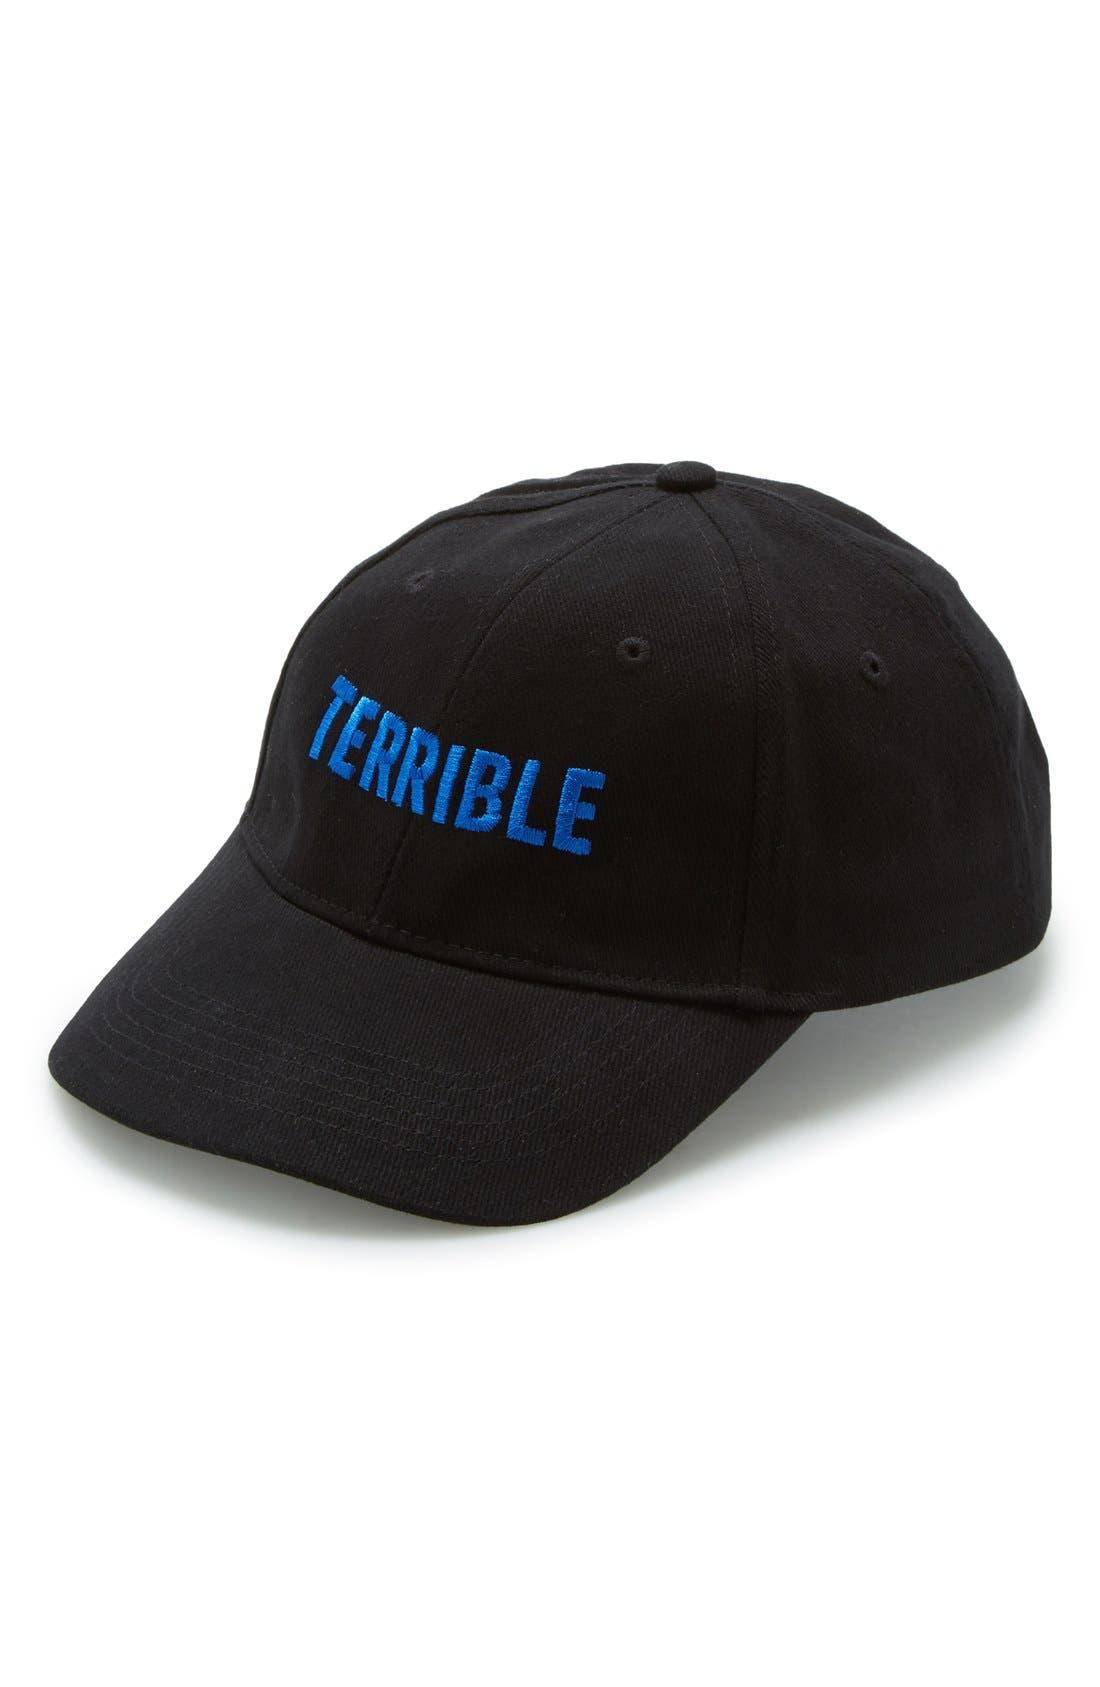 TERRIBLE RECORDS, 'Terrible' Snapback Cap, Main thumbnail 1, color, 400